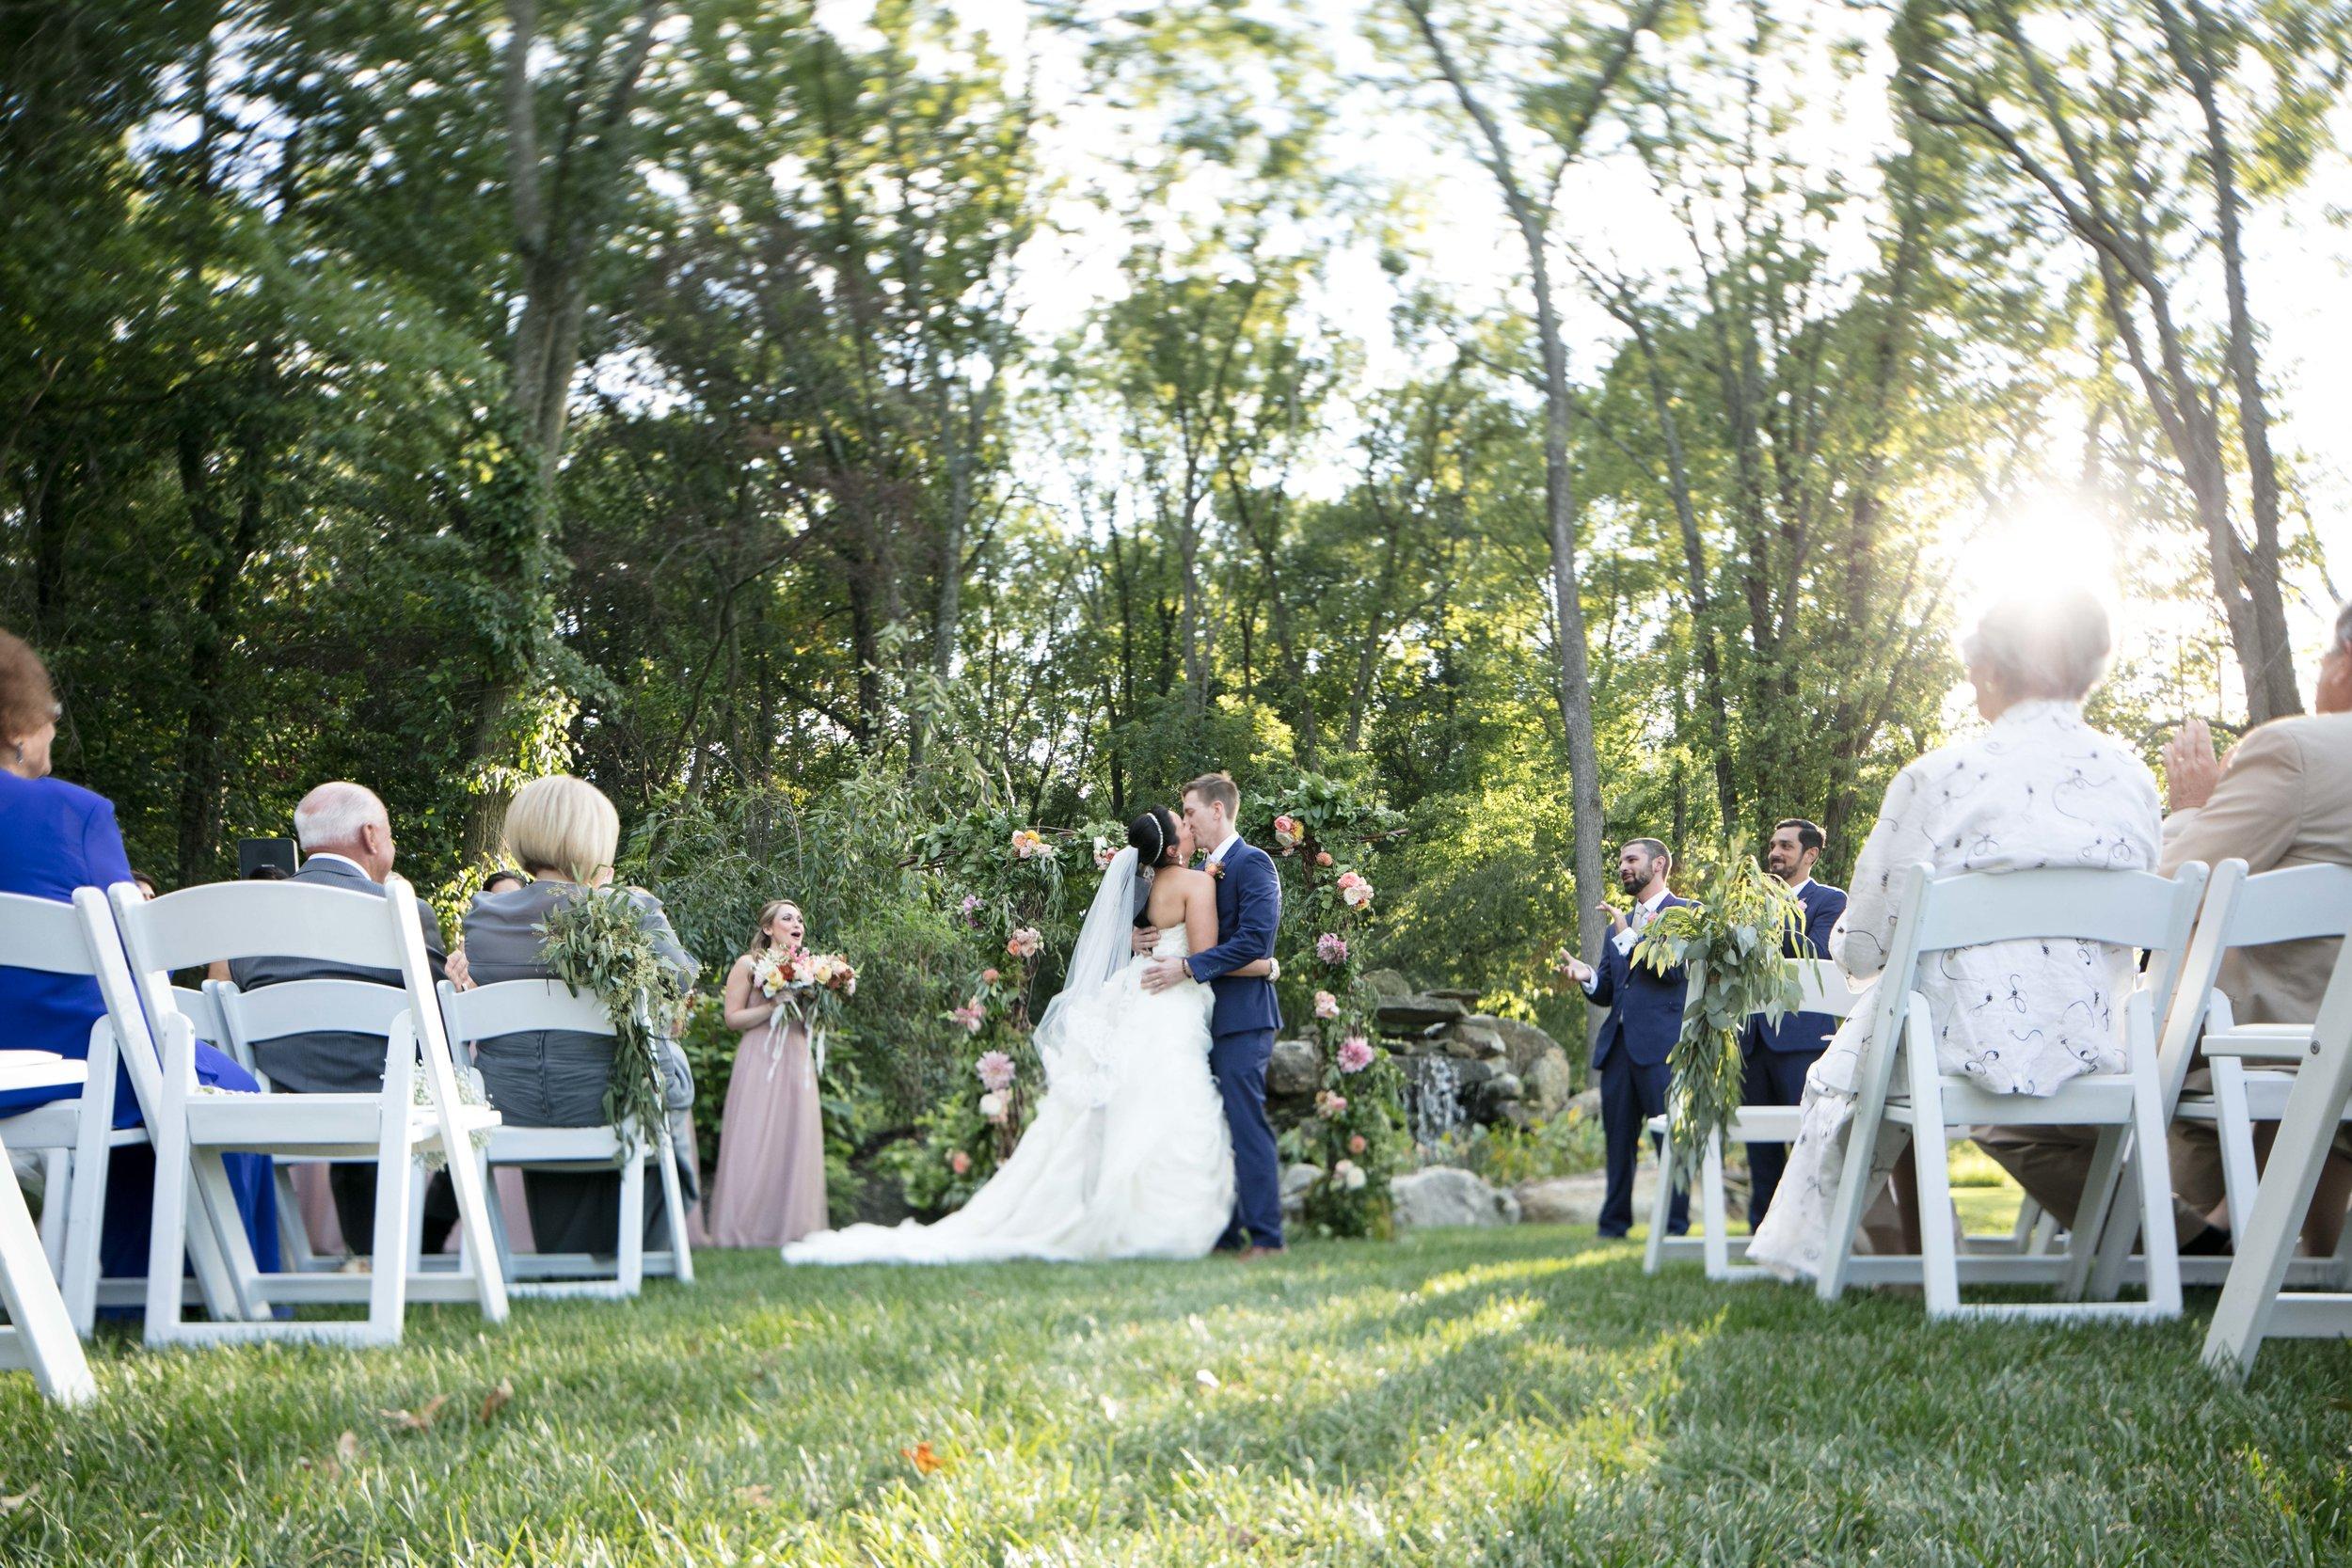 Philadelphia-Wedding-Planner-Heart-And-Dash-NicoleConnor-DrewNoelPhotography-2596.jpg